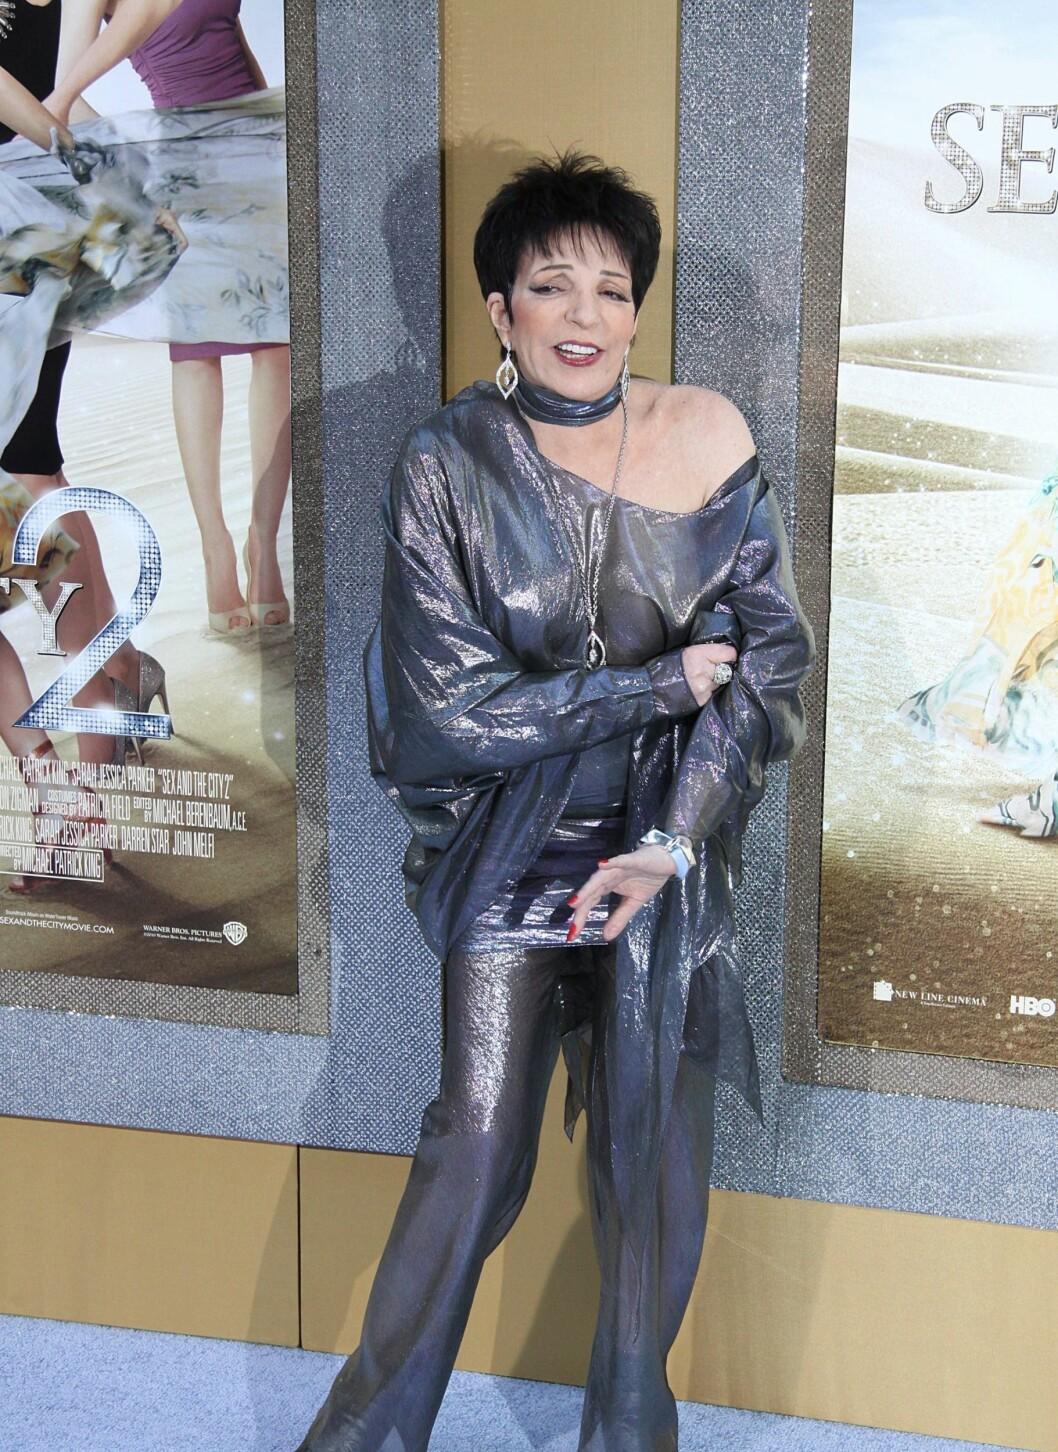 ...samt sanger og skuespiller Liza Minnelli. Foto: All Over Press